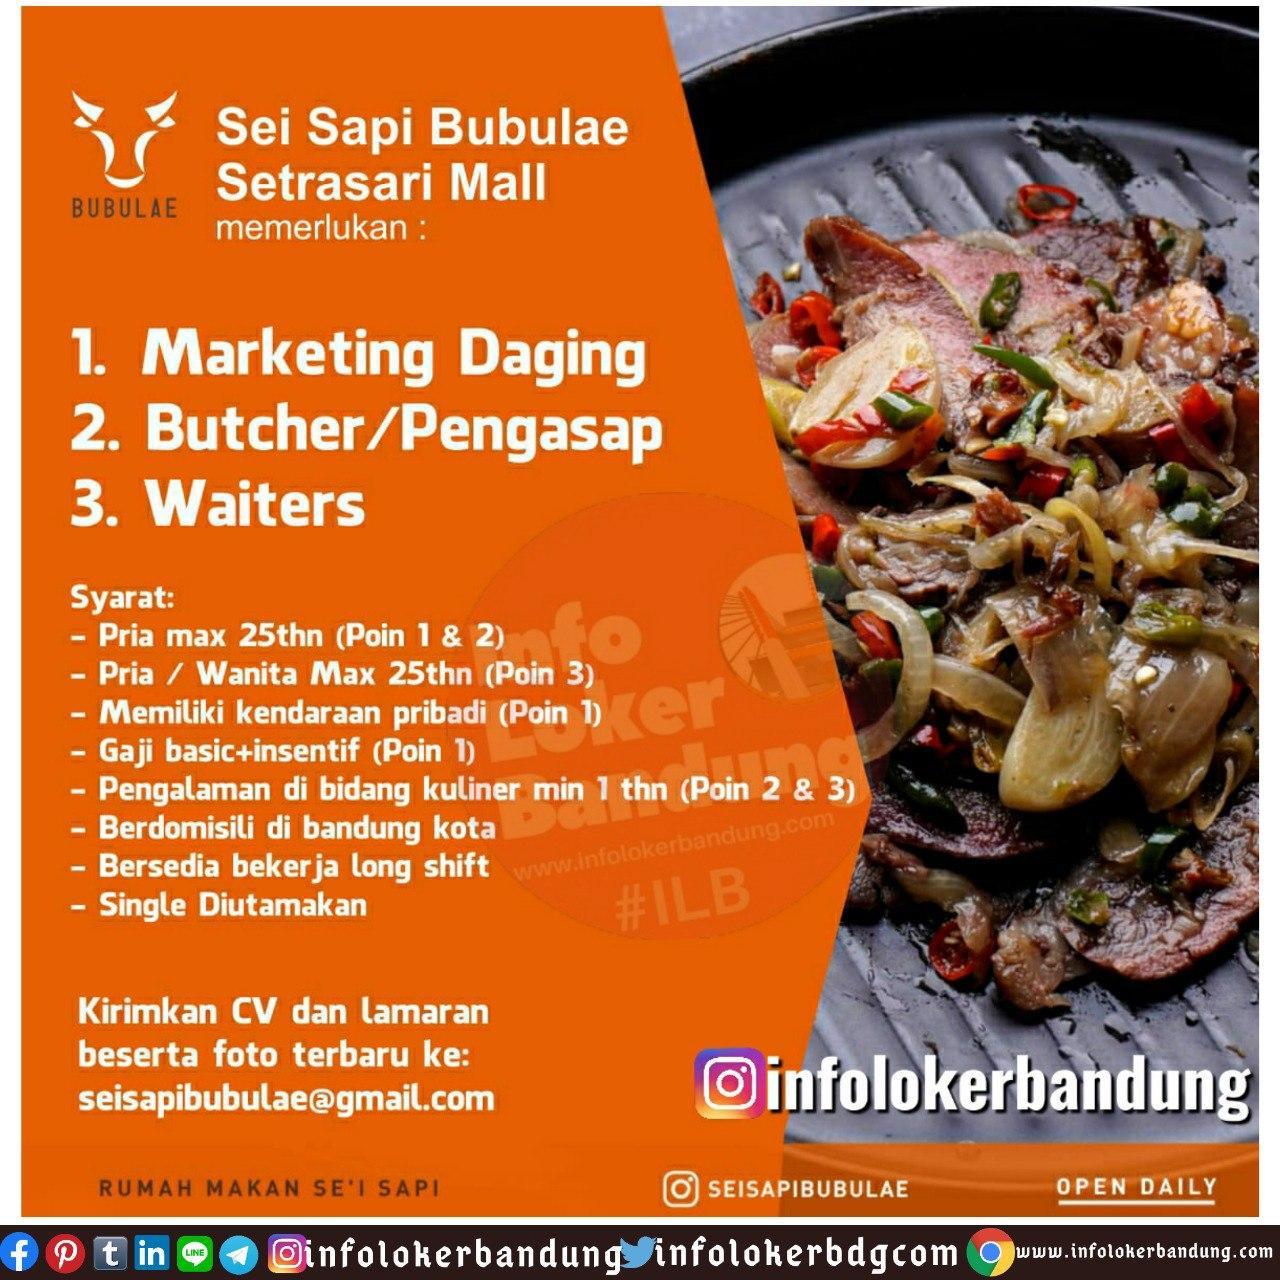 Lowongan Kerja Sei Sapi Bubulae Setrasari Mall Bandung Juni 2020